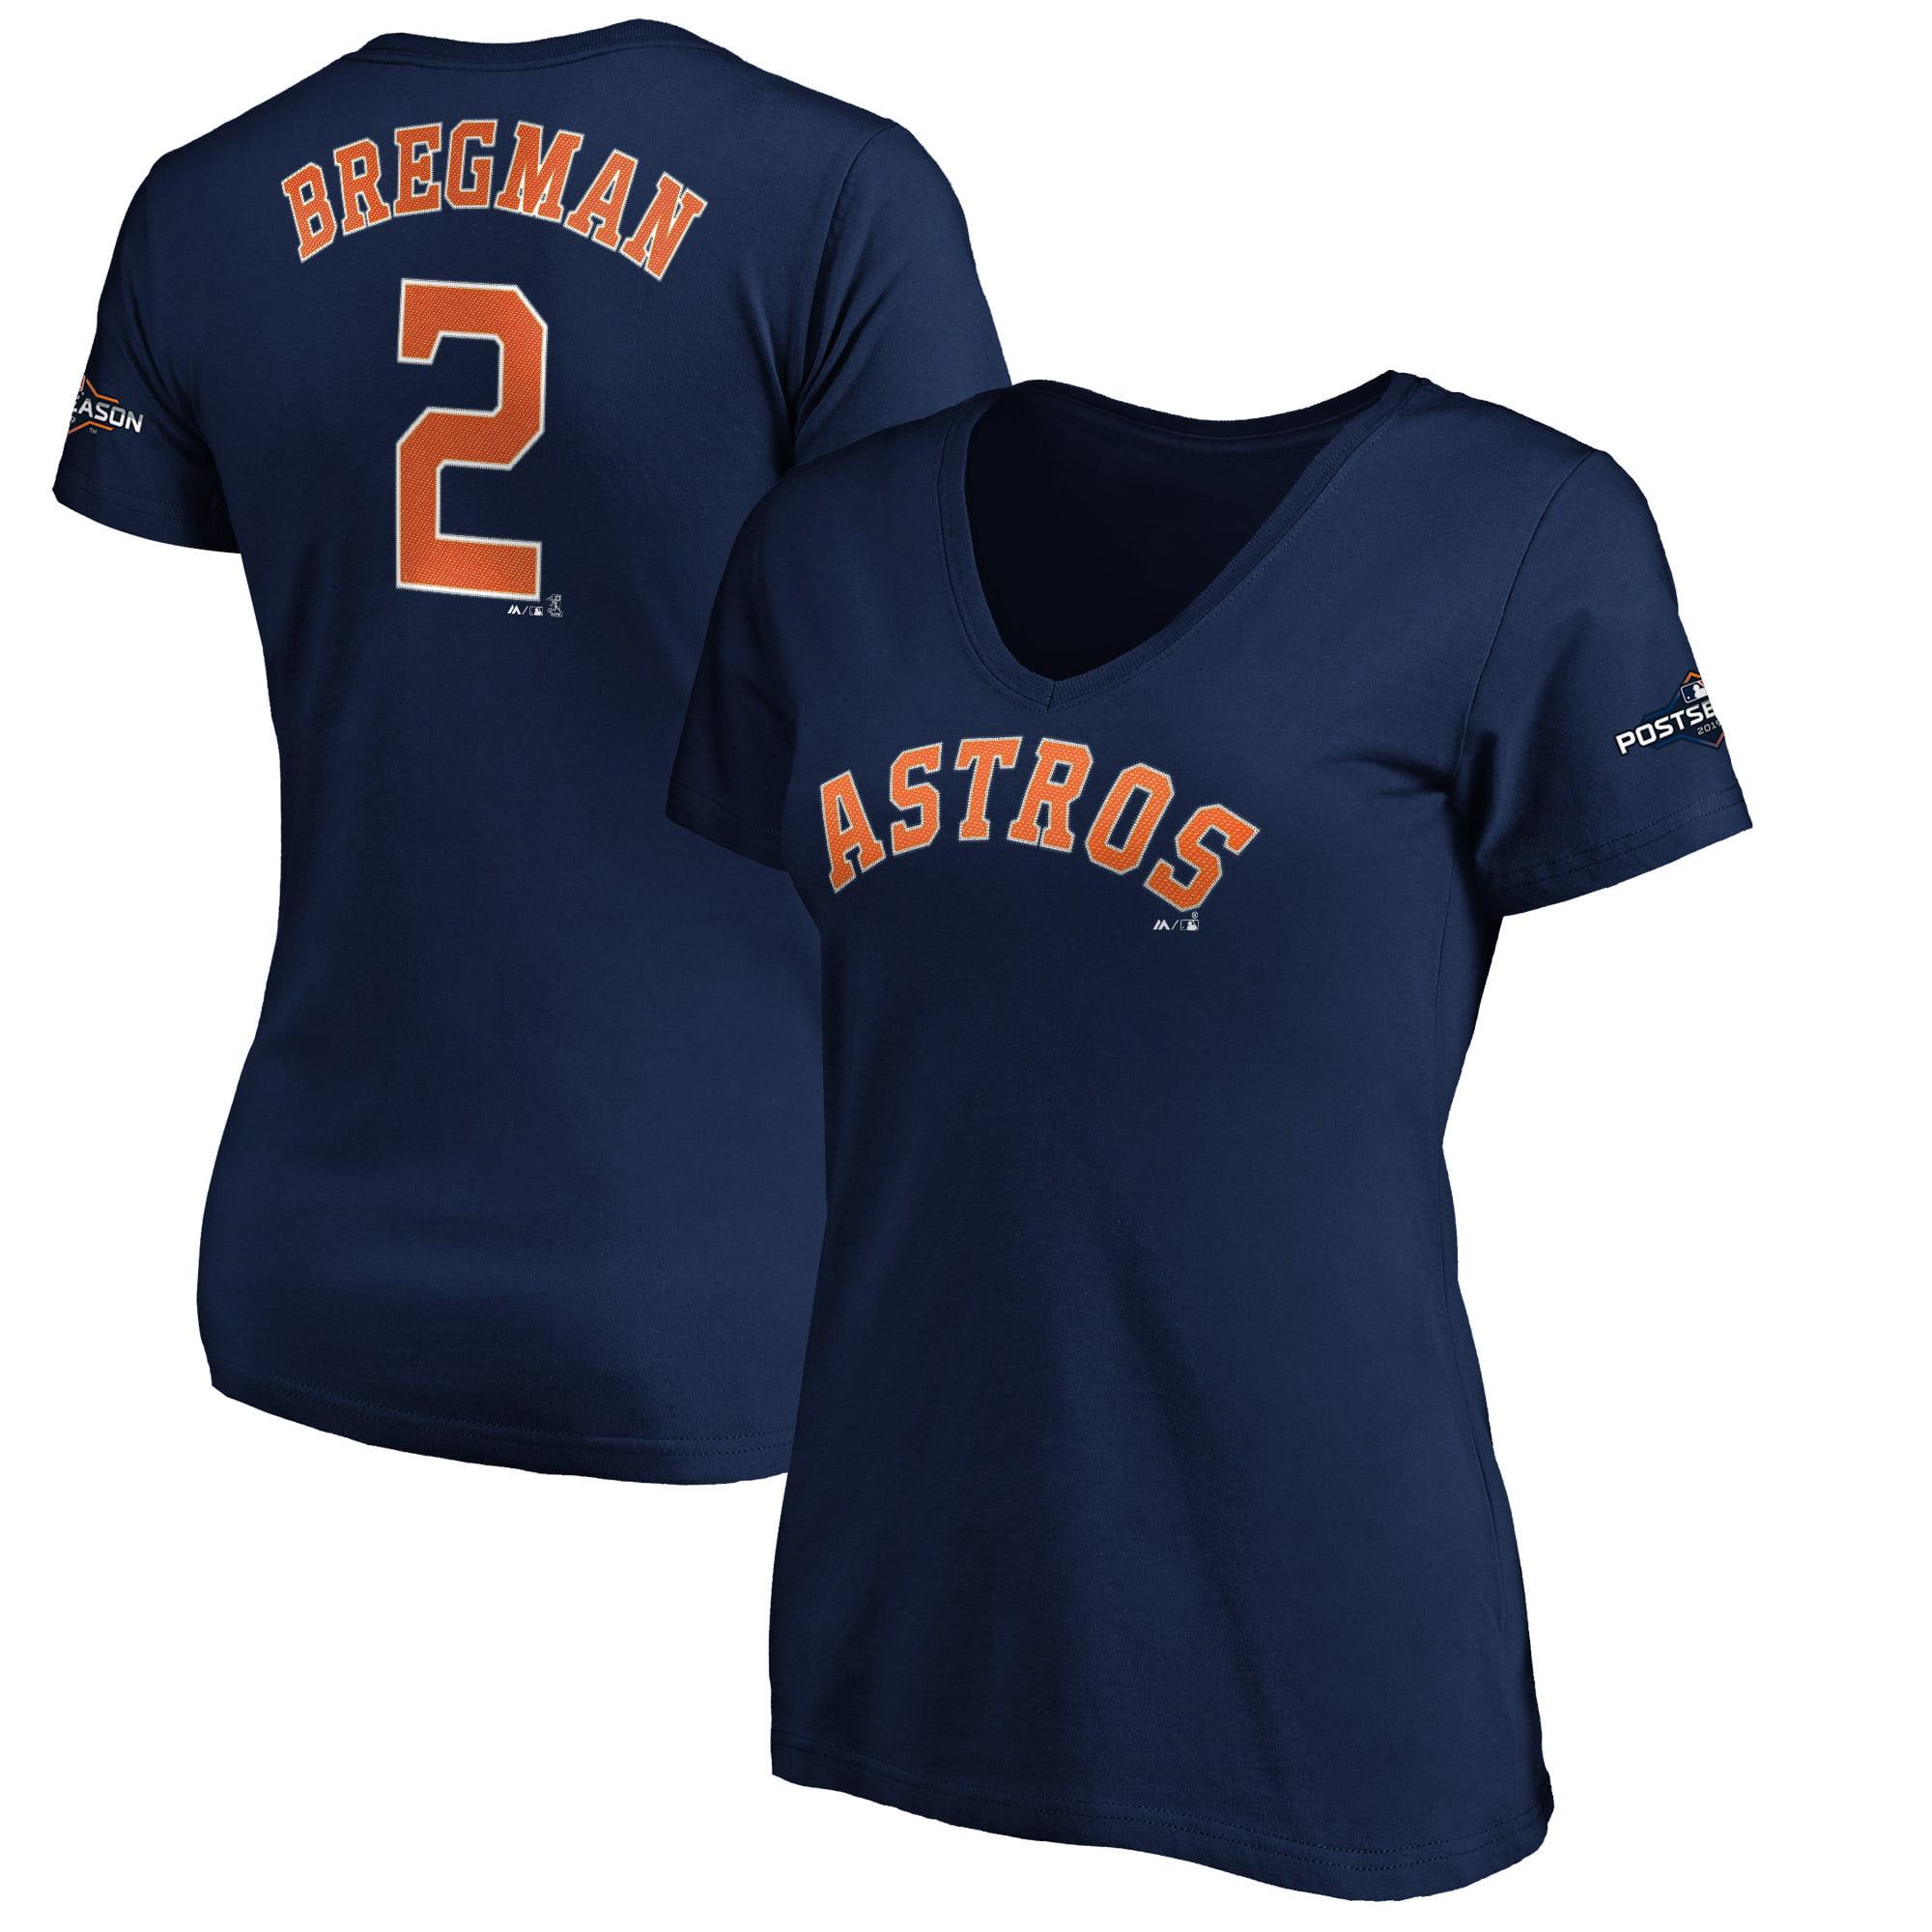 Alex Bregman Houston Astros Majestic Women's 2019